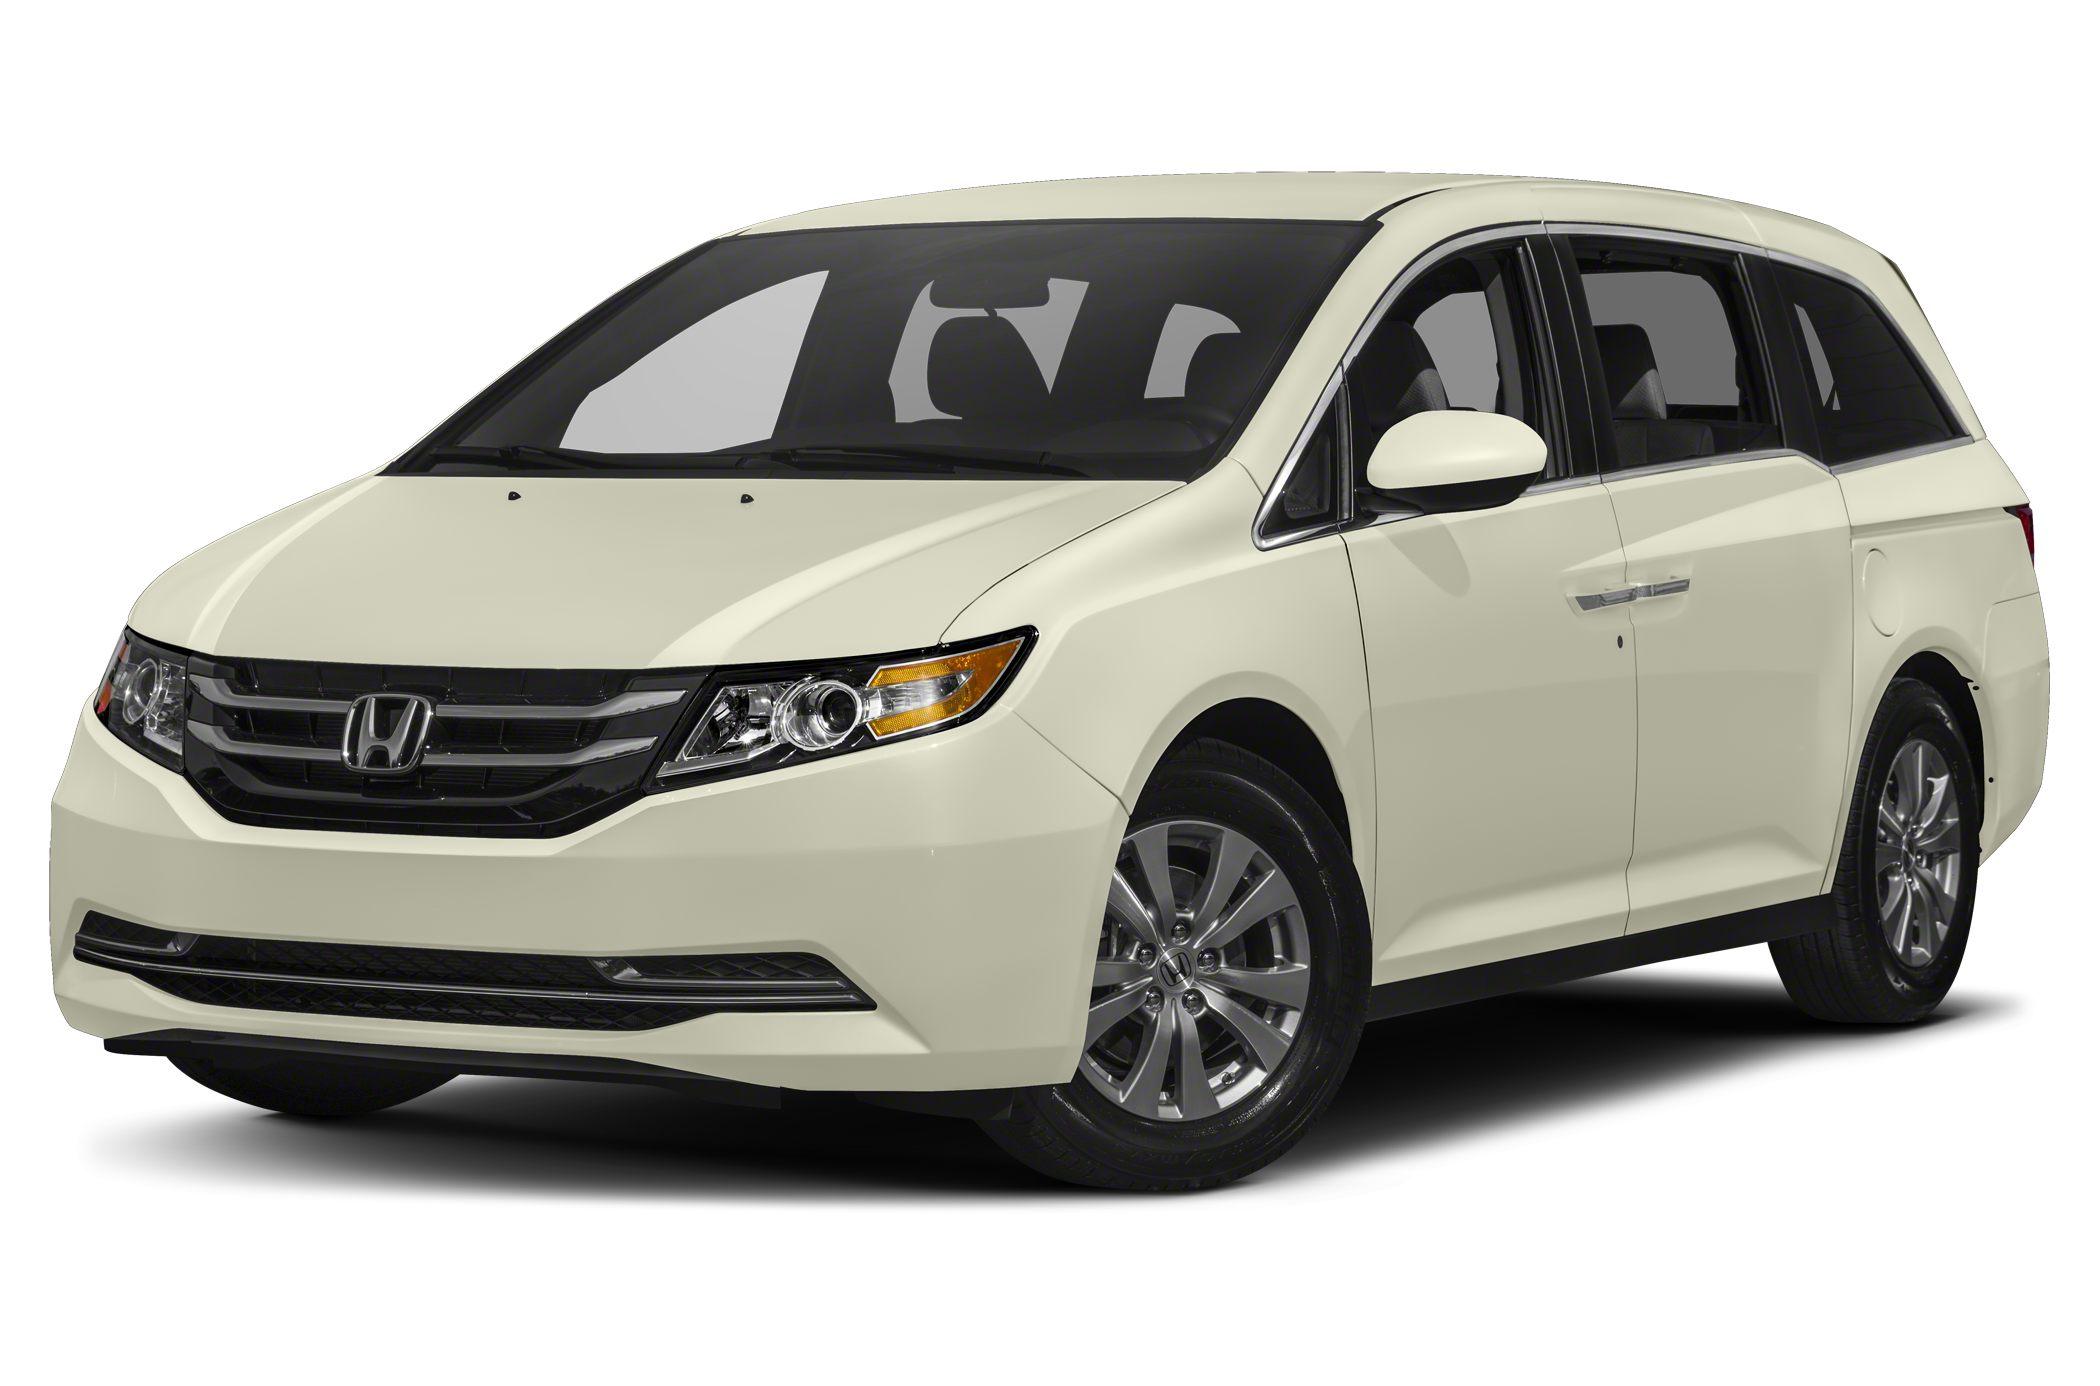 2017 Honda Odyssey Se >> 2017 Honda Odyssey Se Passenger Van Specs And Prices